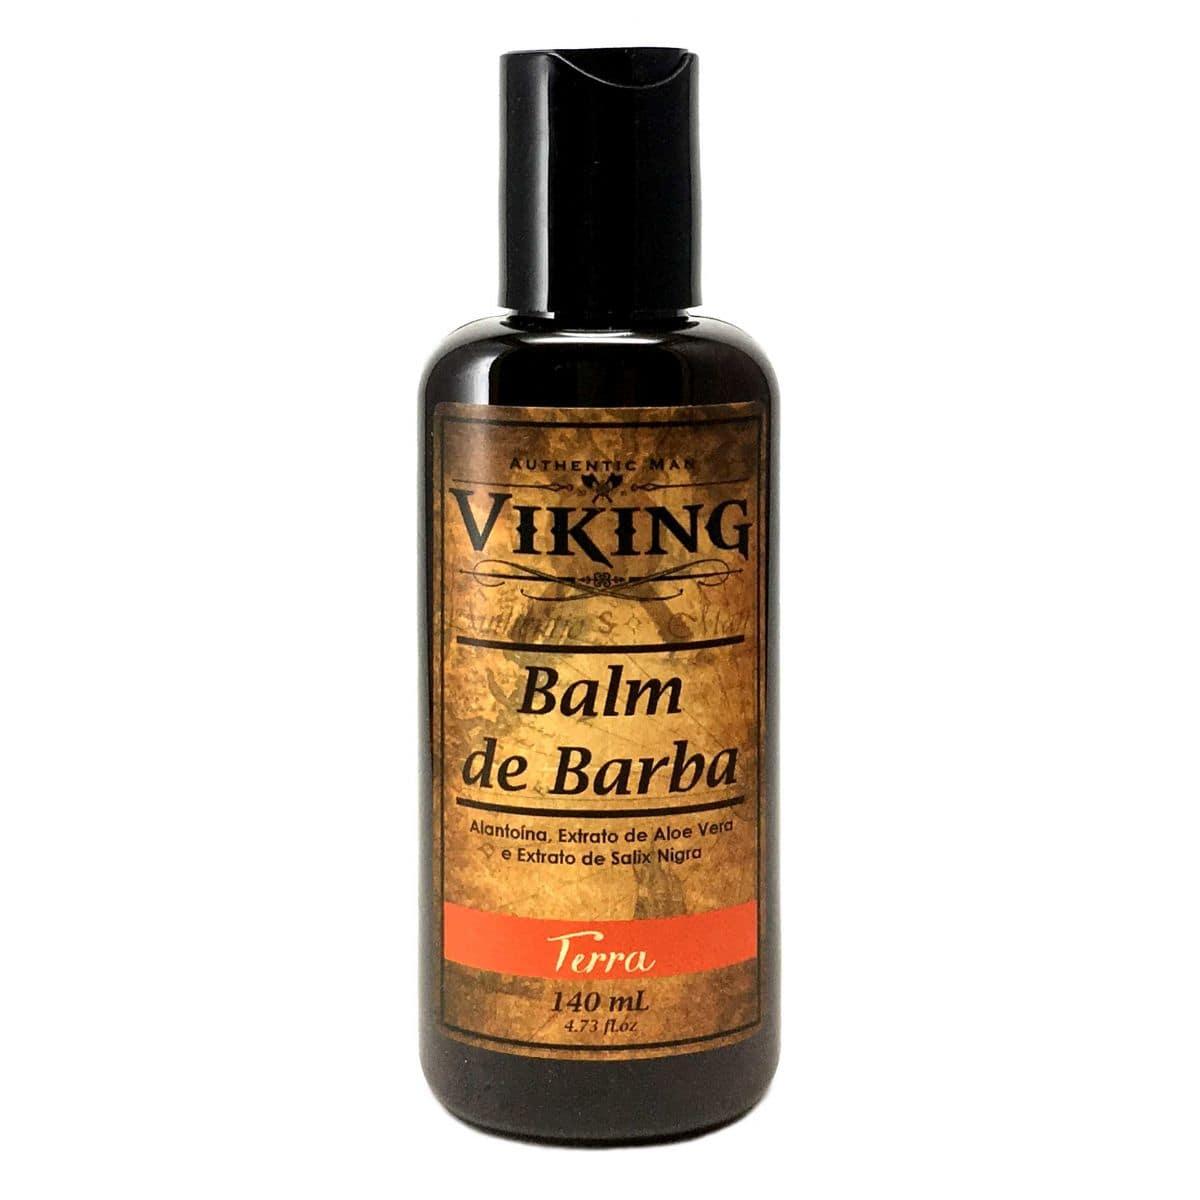 Balm de Barba Terra Viking - 140mL